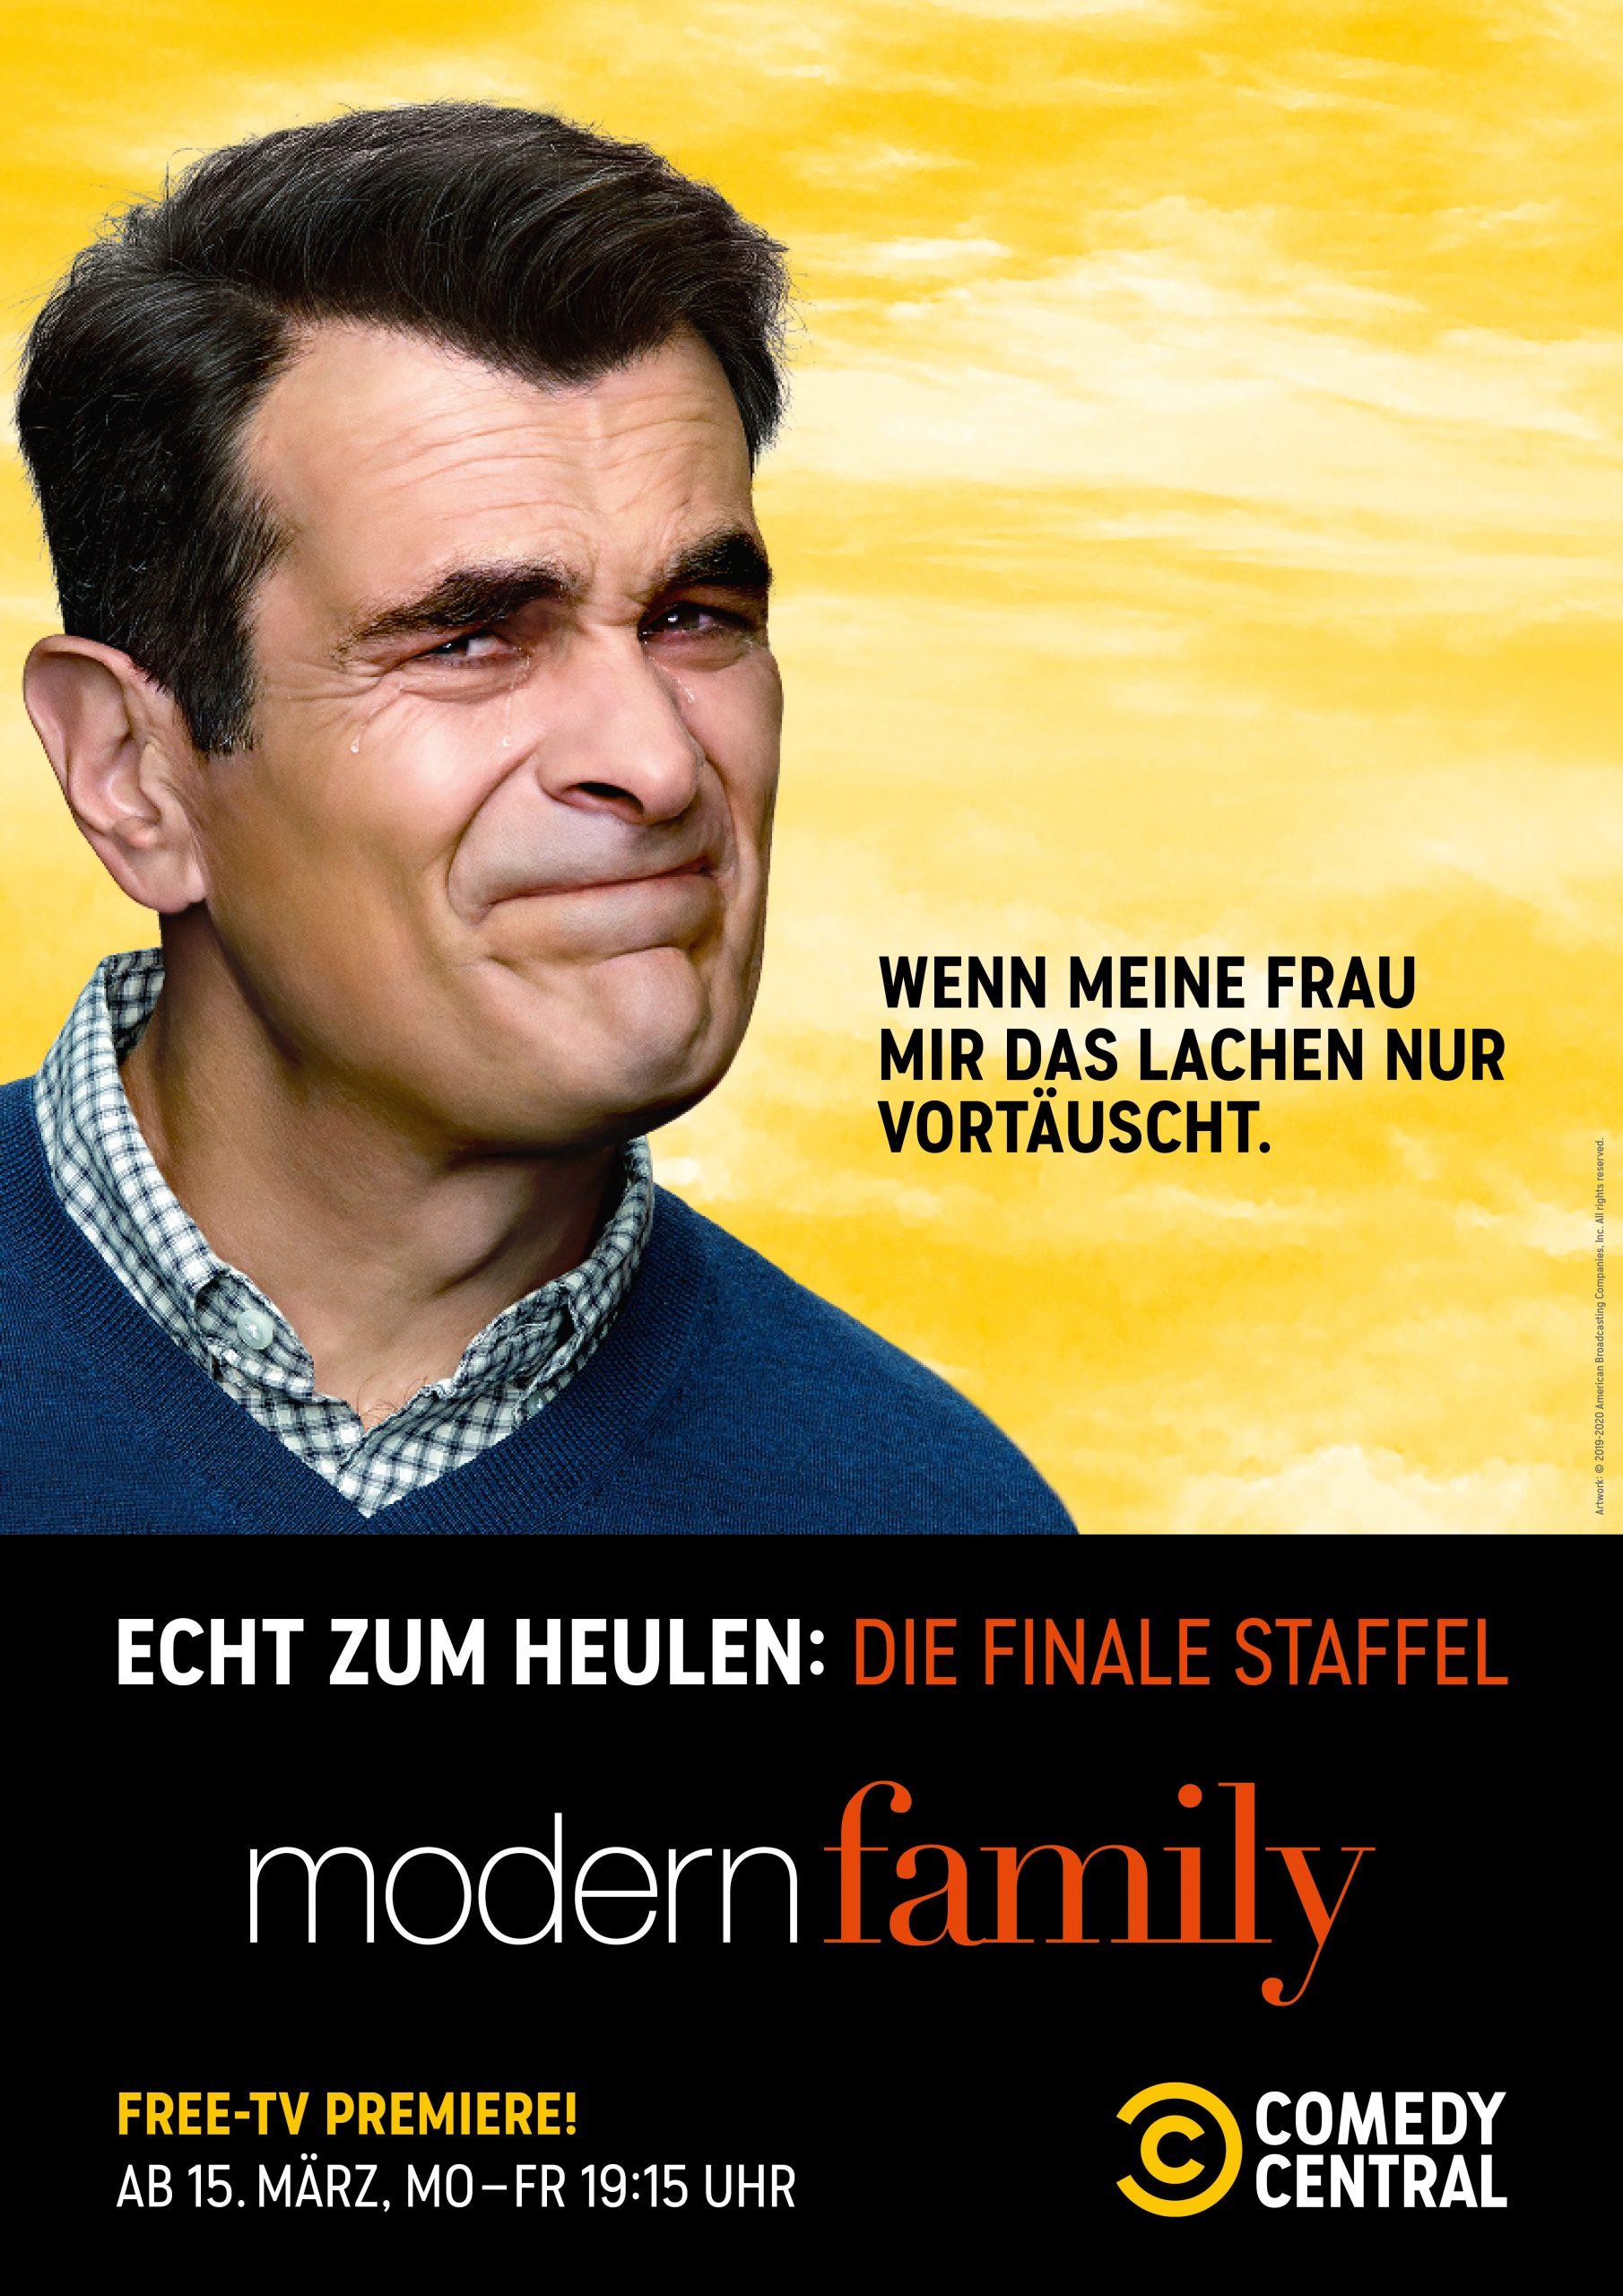 210210_CC_Modern_Family_MasterLayouts_Hochformat4